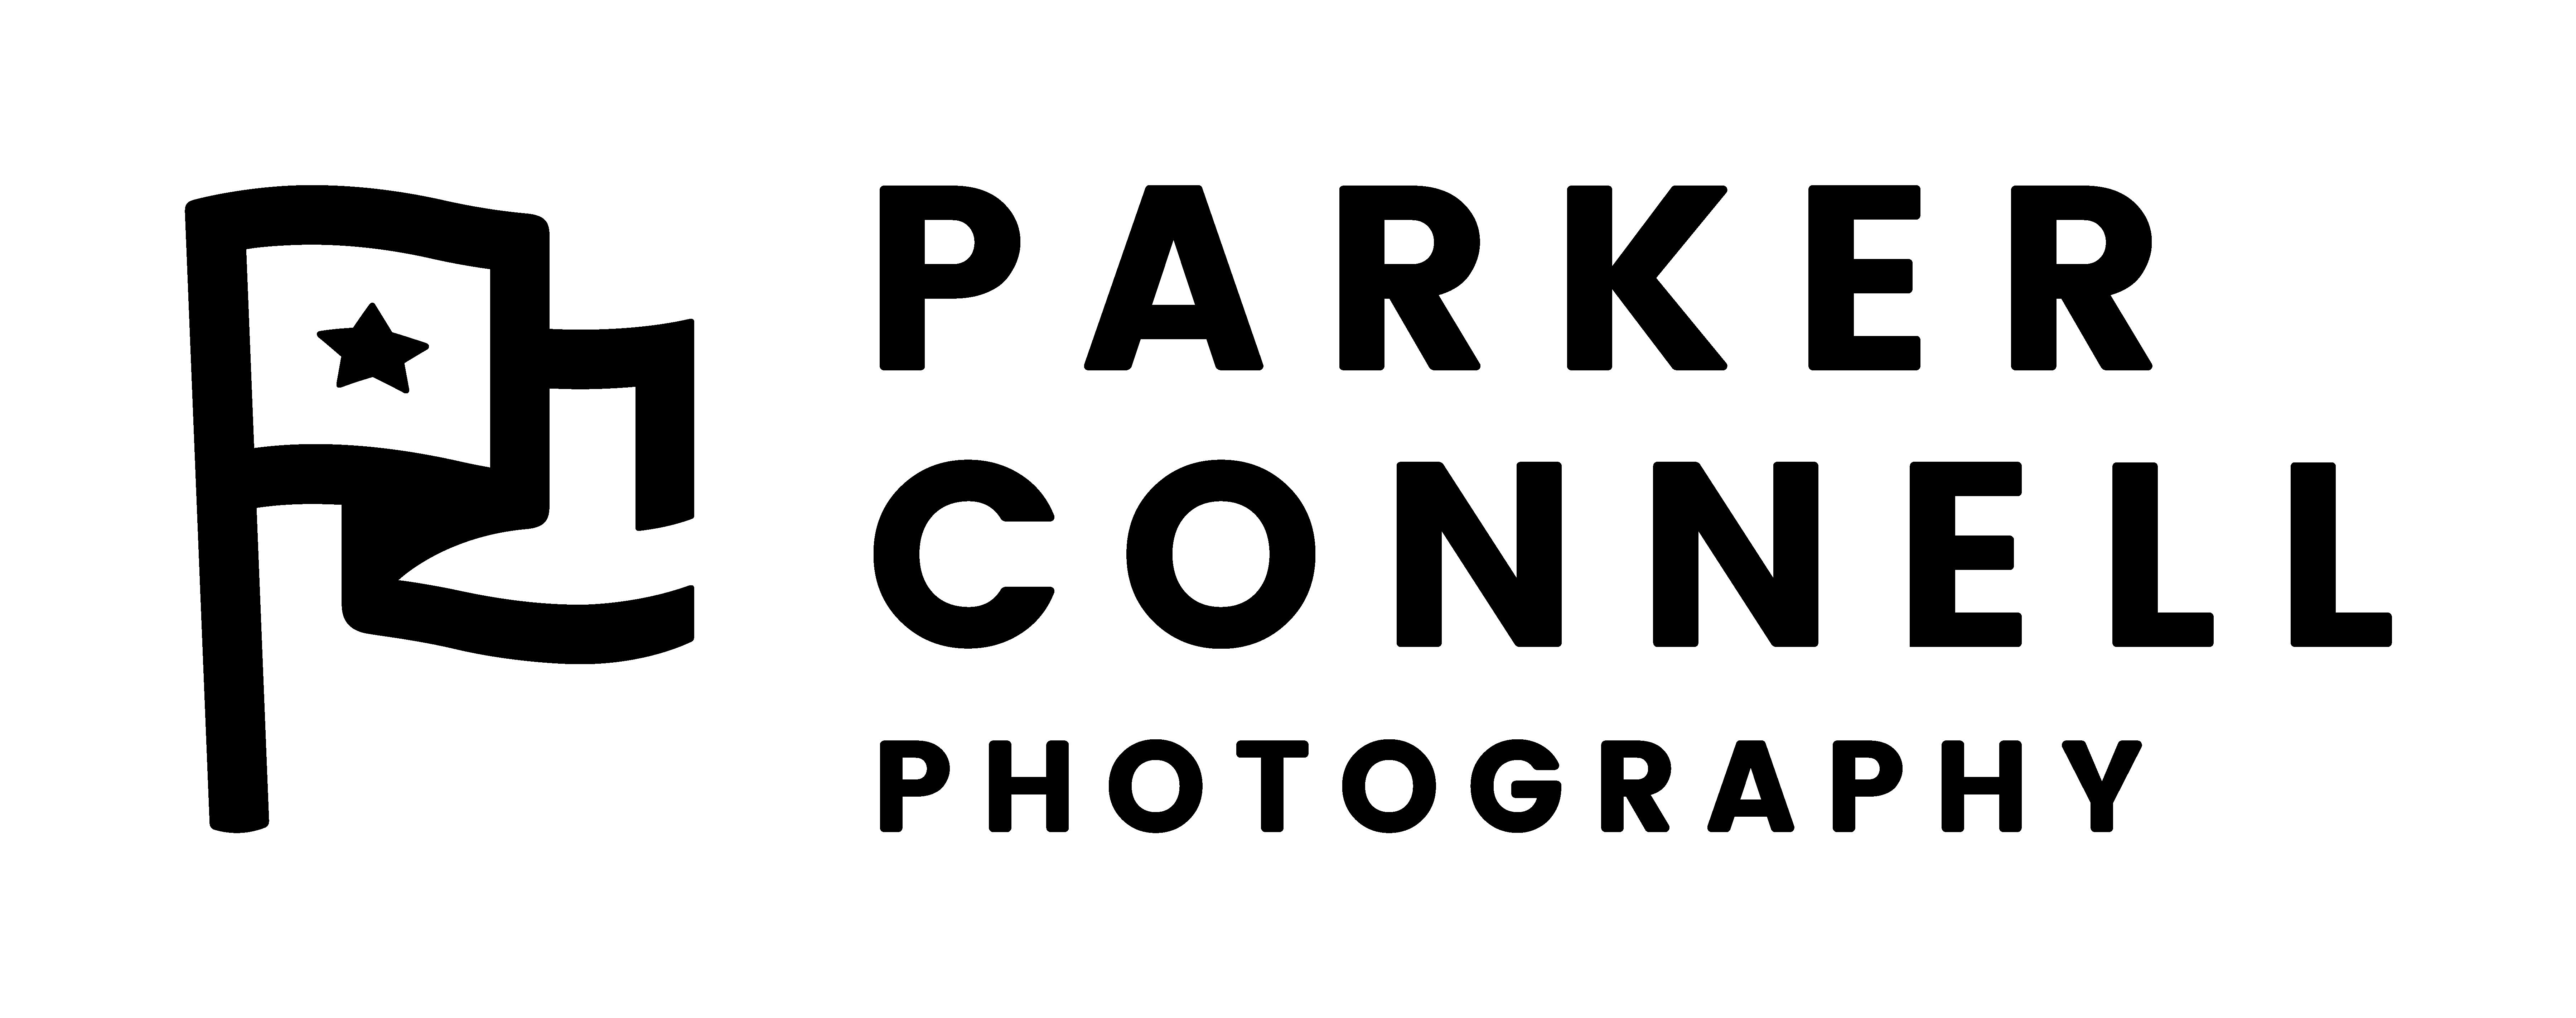 Parker Connell